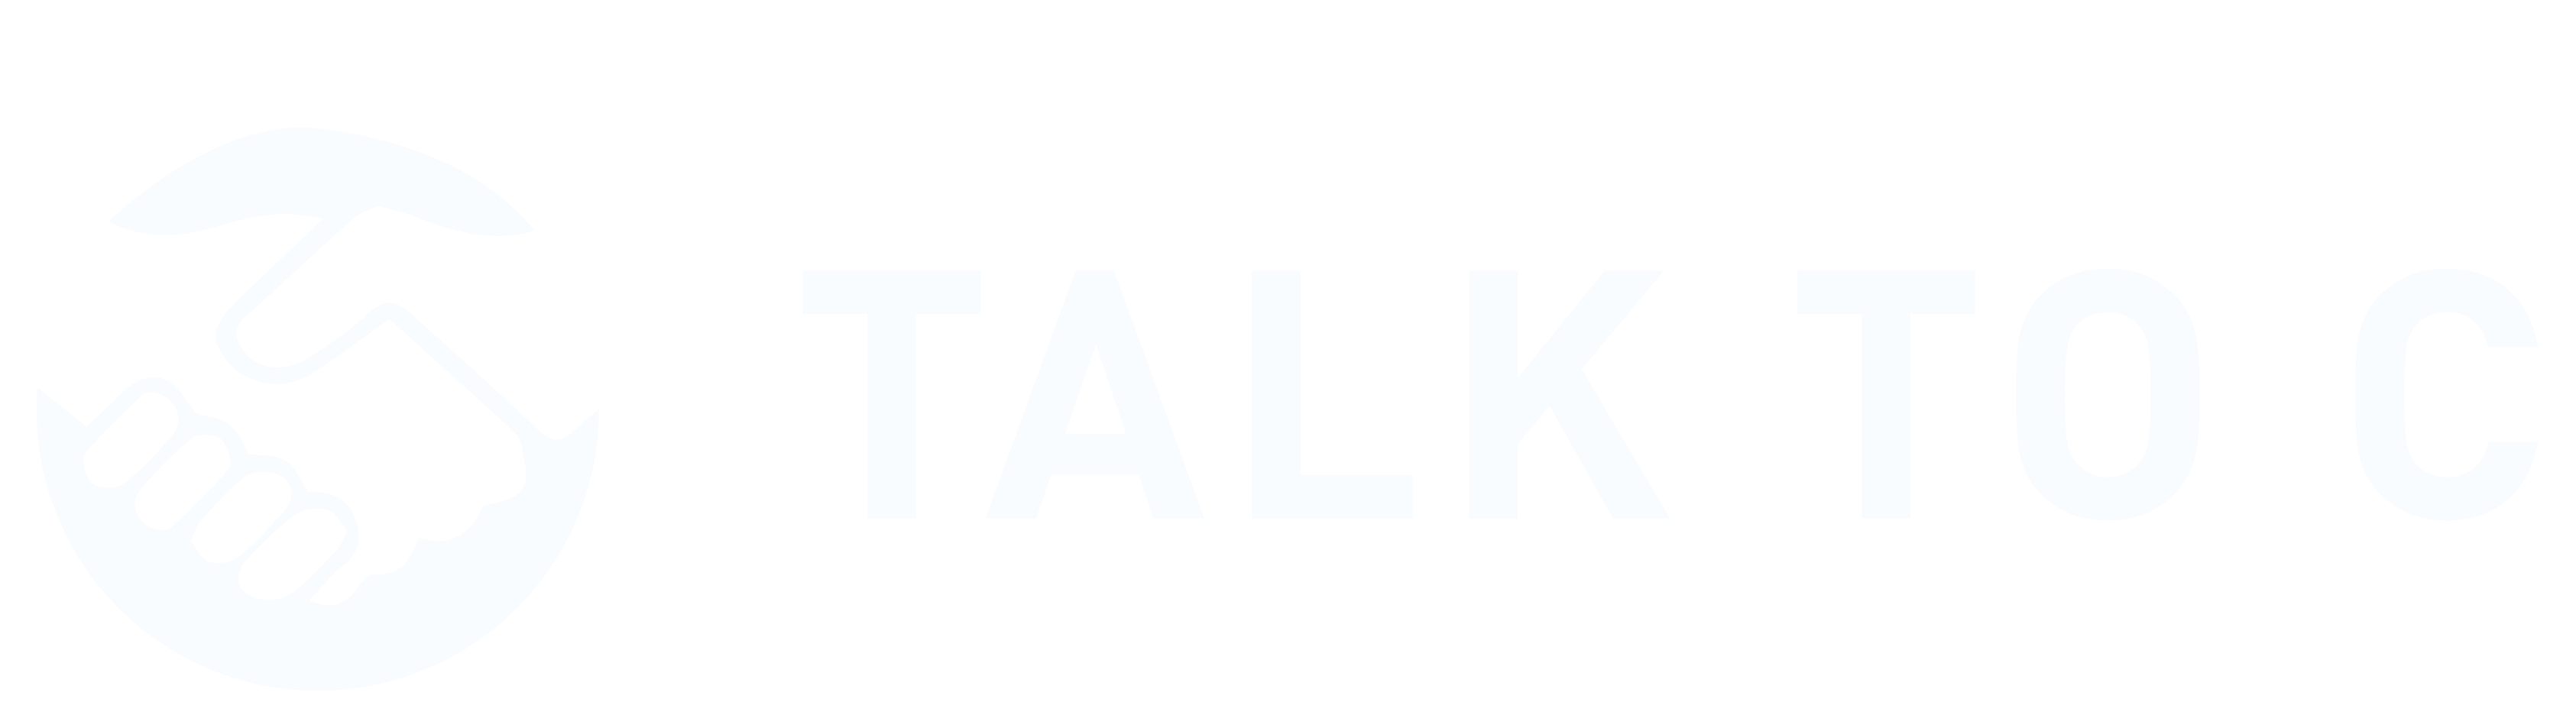 Talk To C